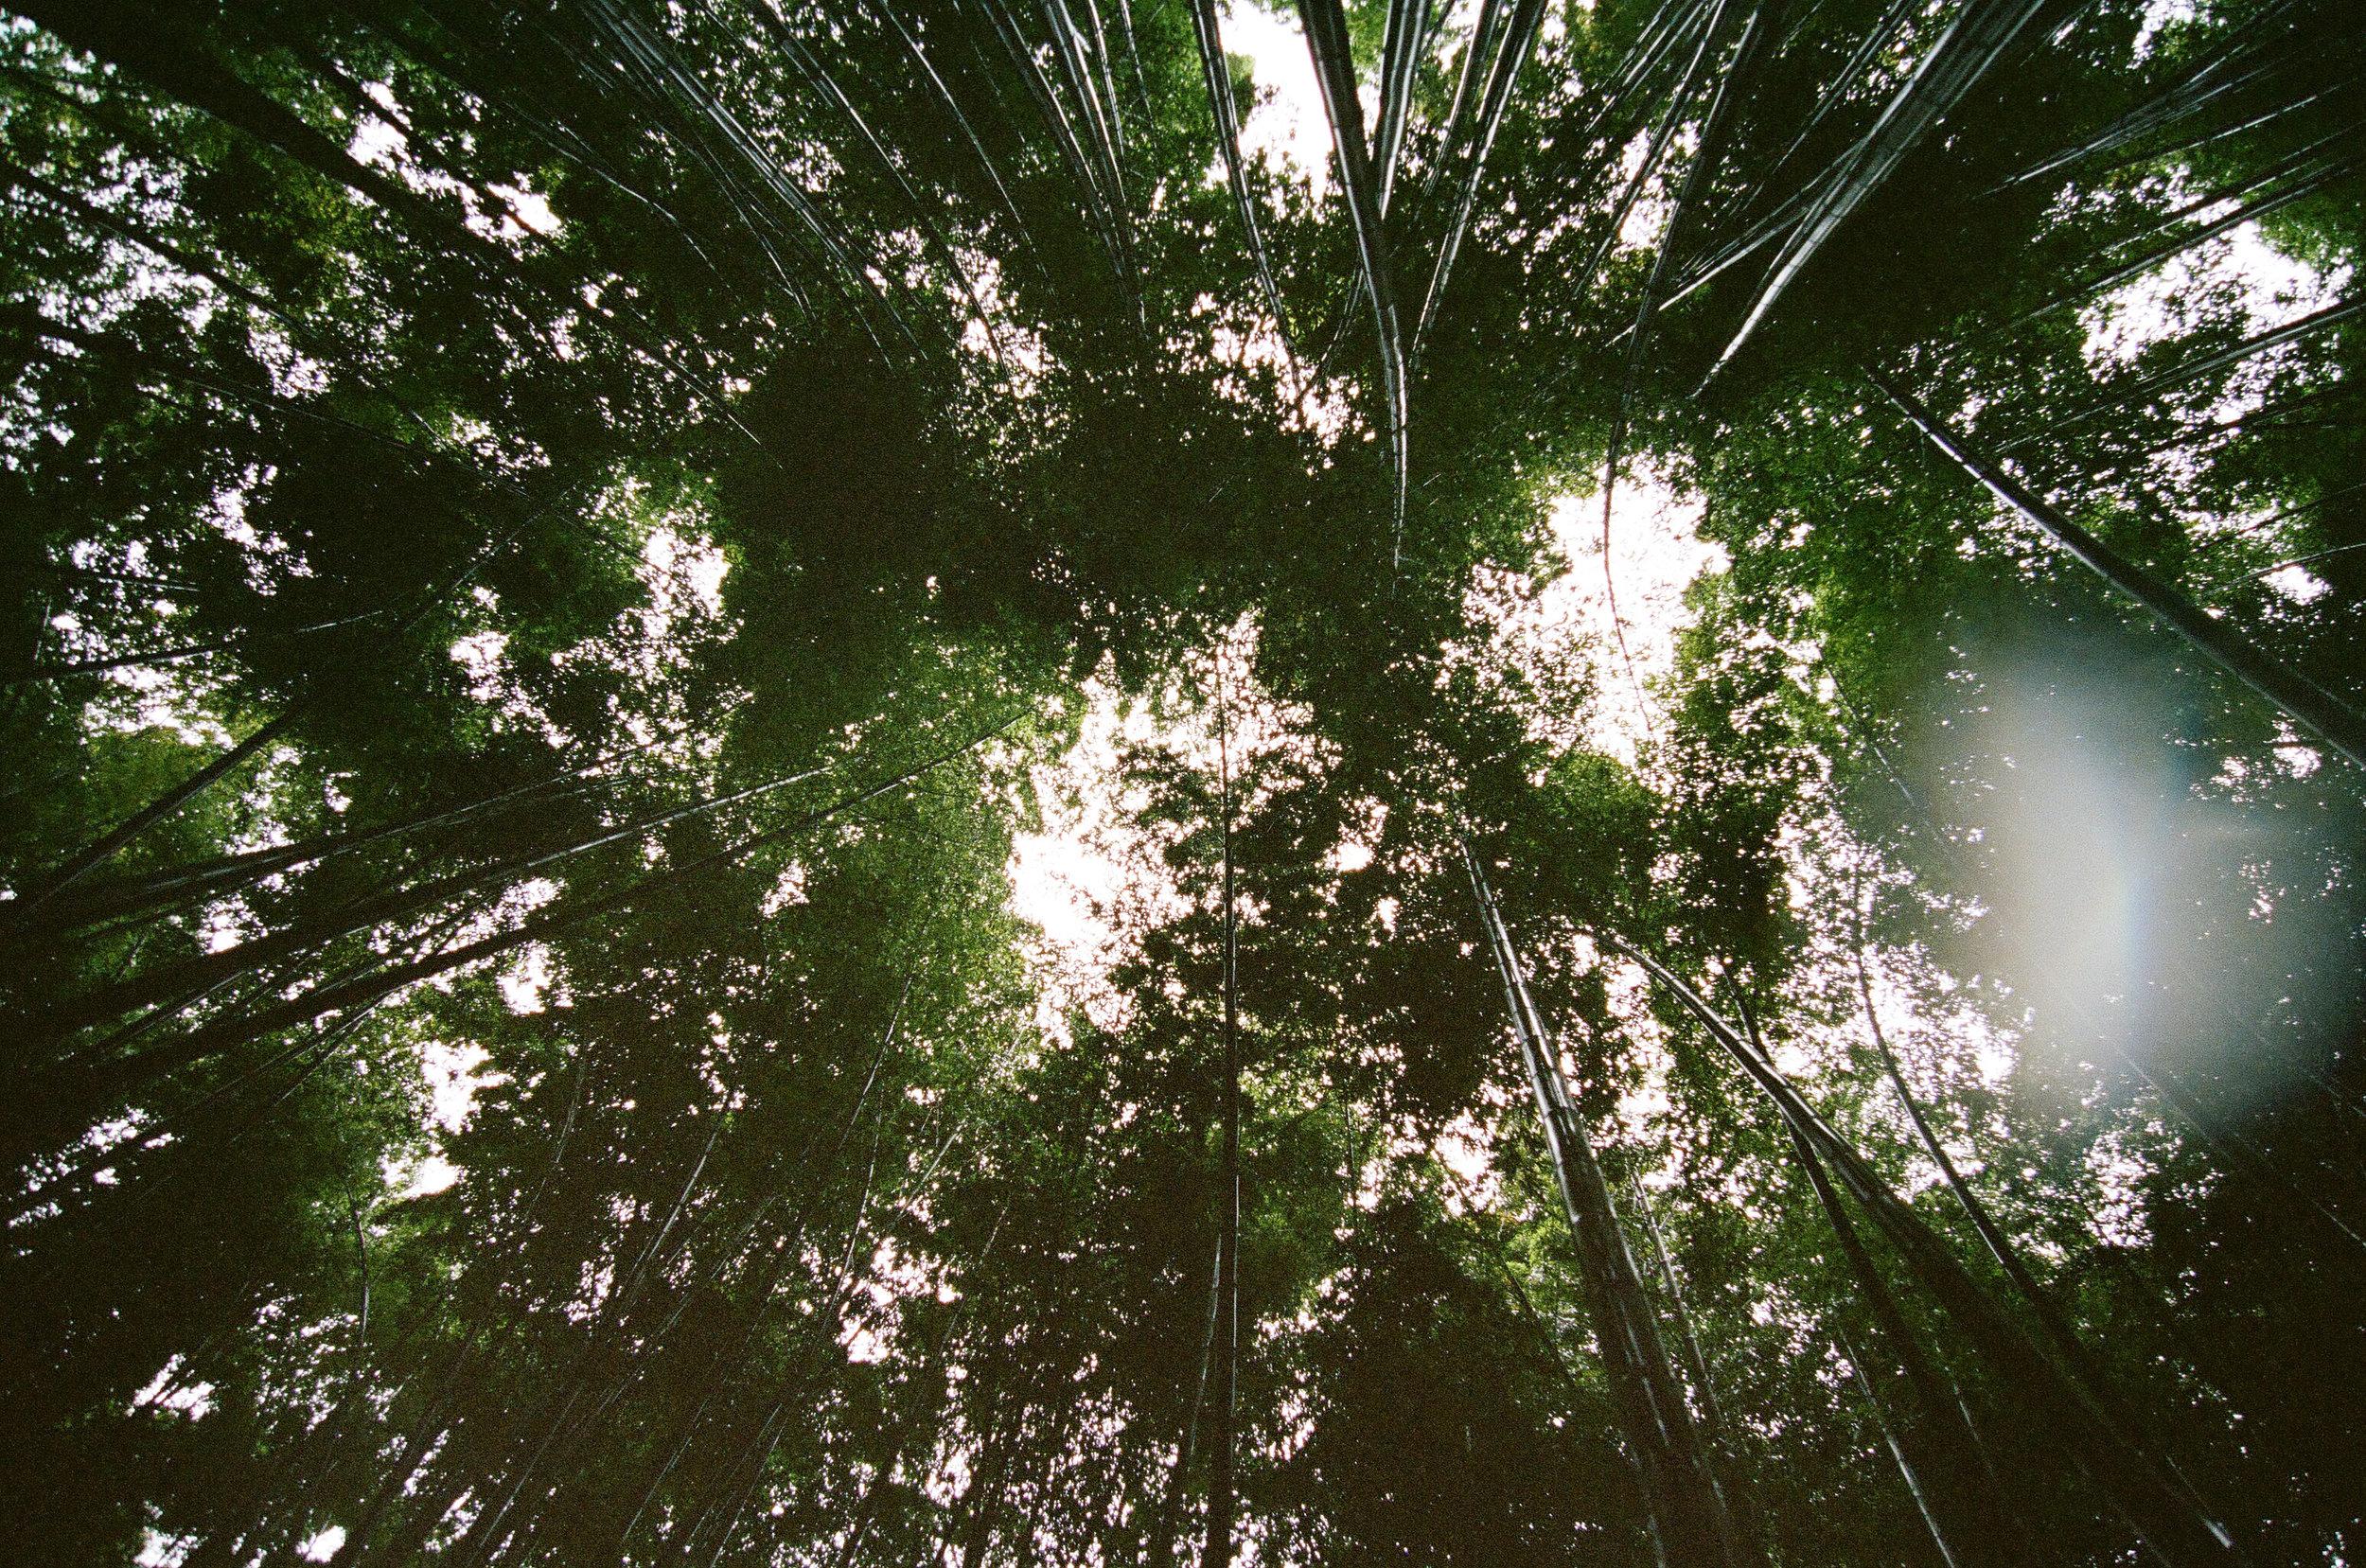 bamboo-forest-Tokyo-4-cameliamanea.jpg